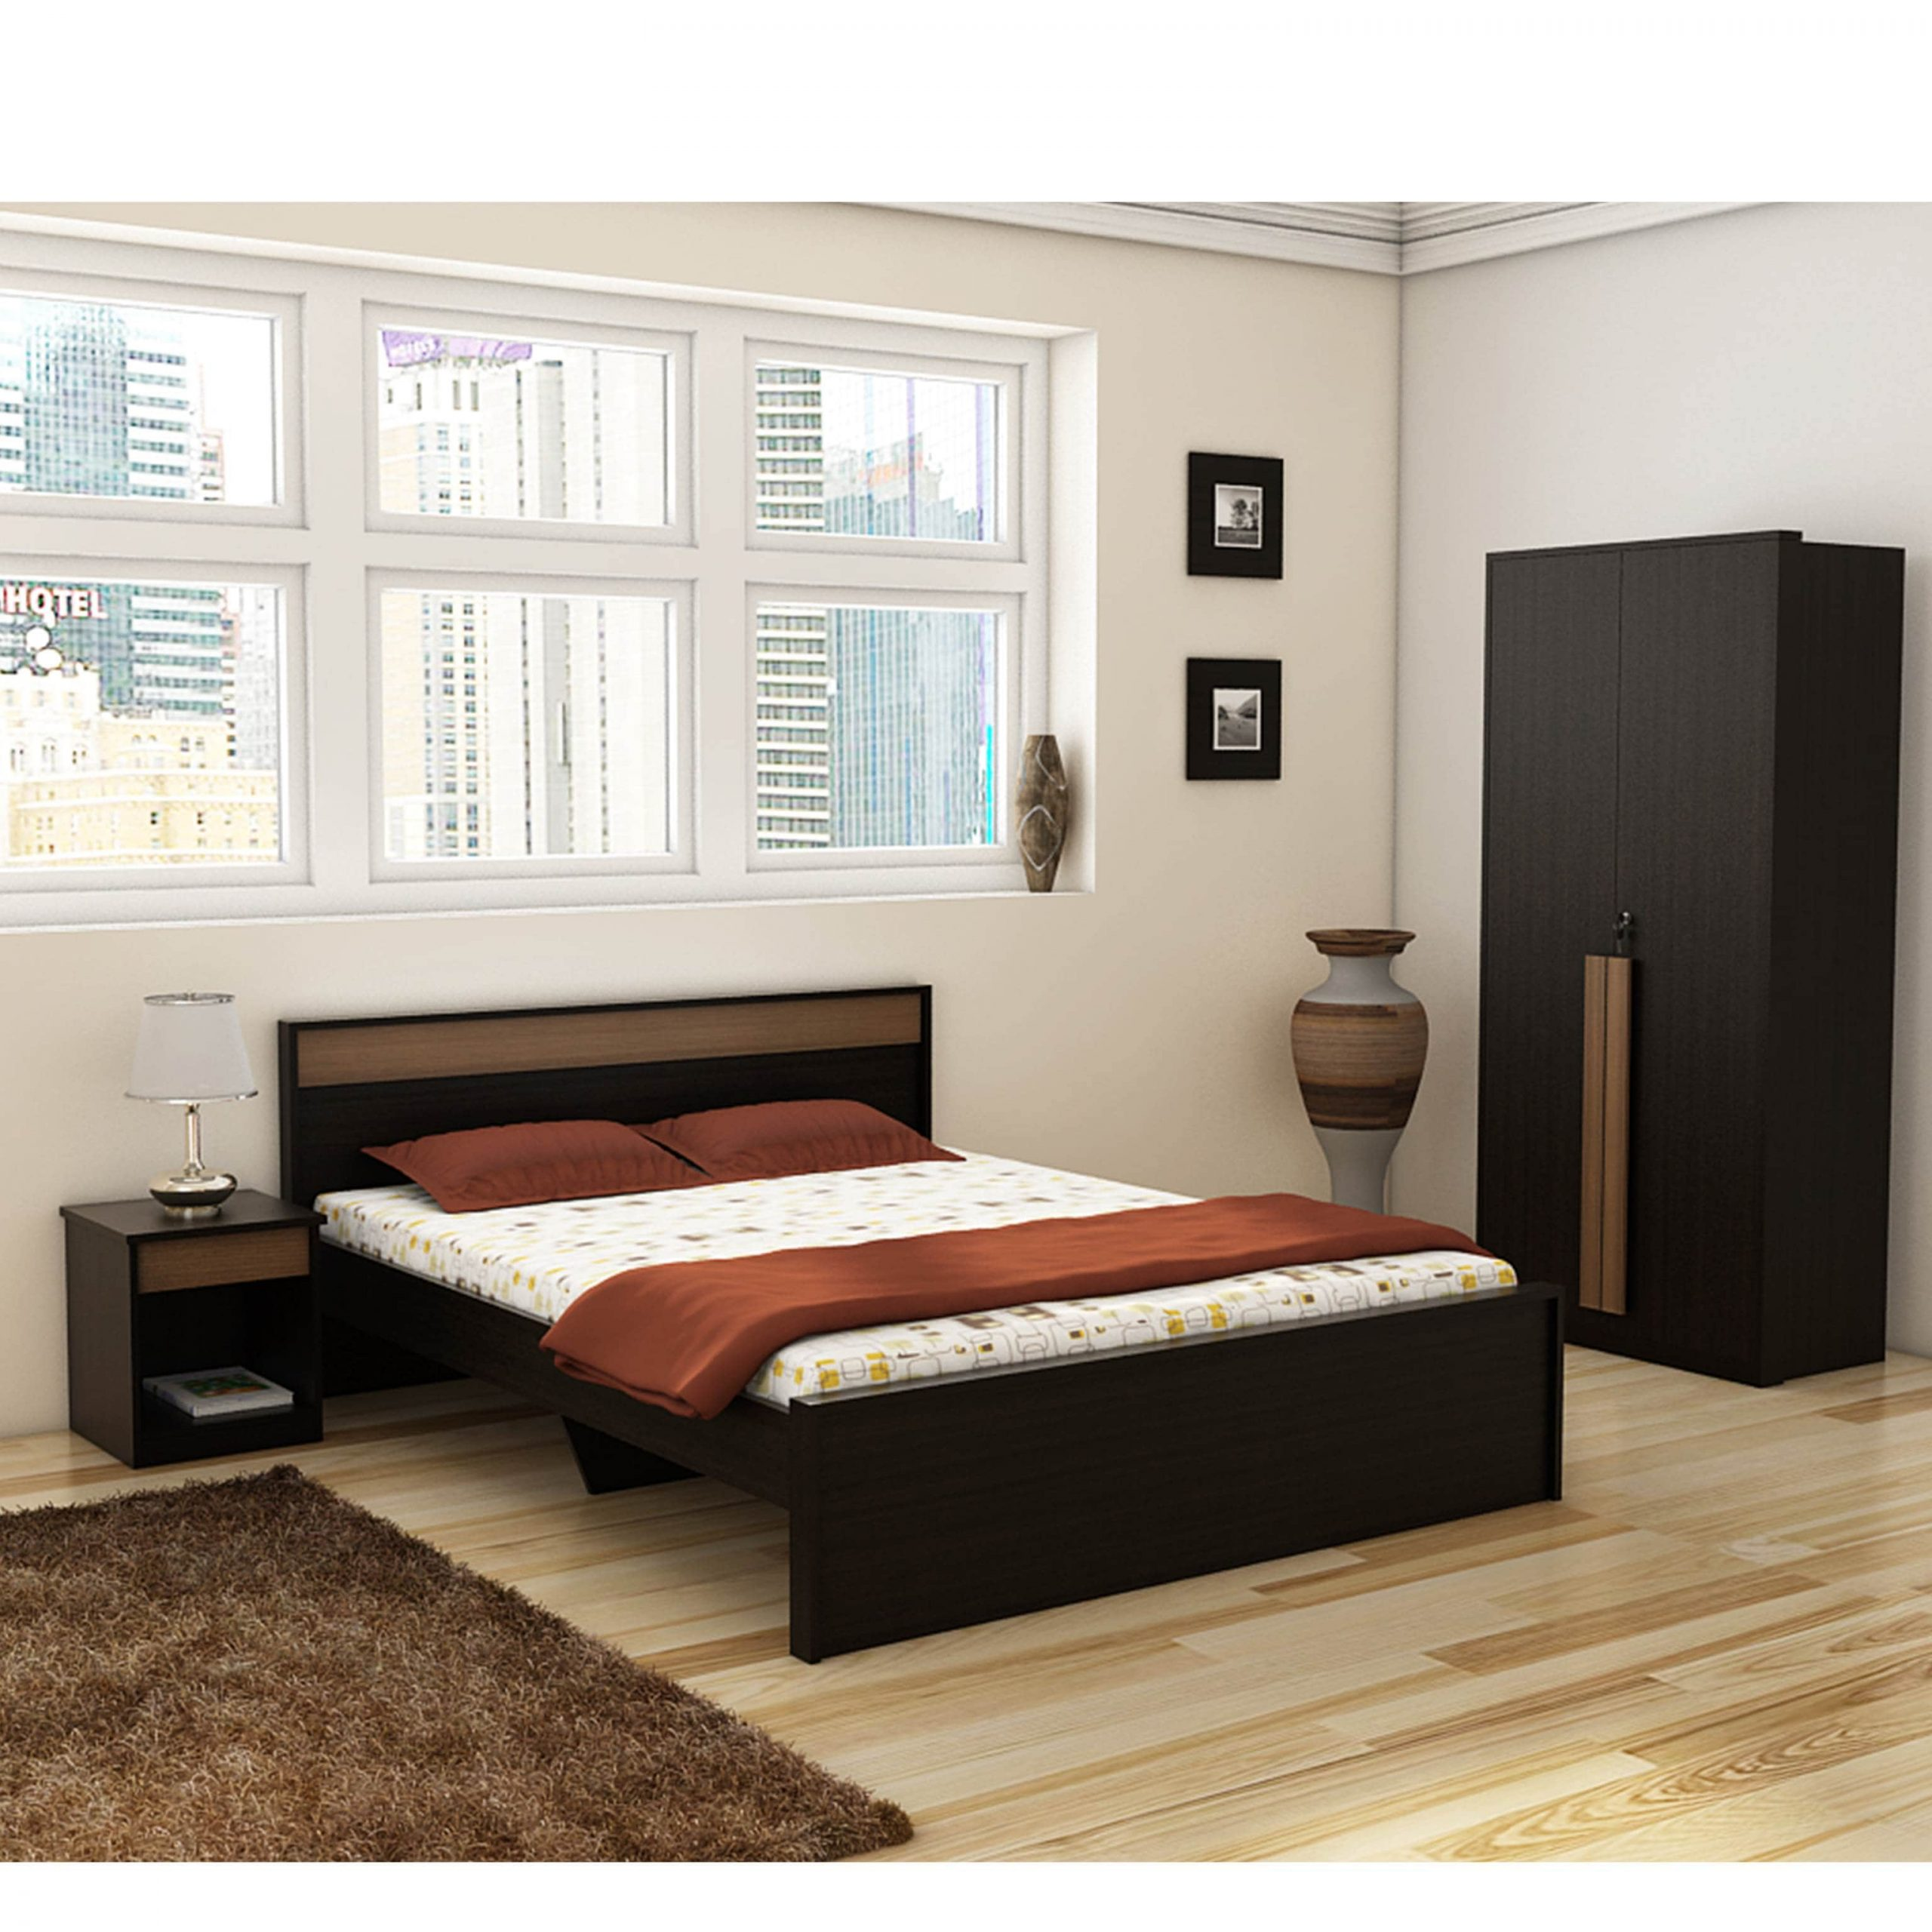 Roma Bedroom Set   Betterhomeindia   Indian Bedroom Set Regarding Bedroom Sofas And Chairs (View 3 of 15)